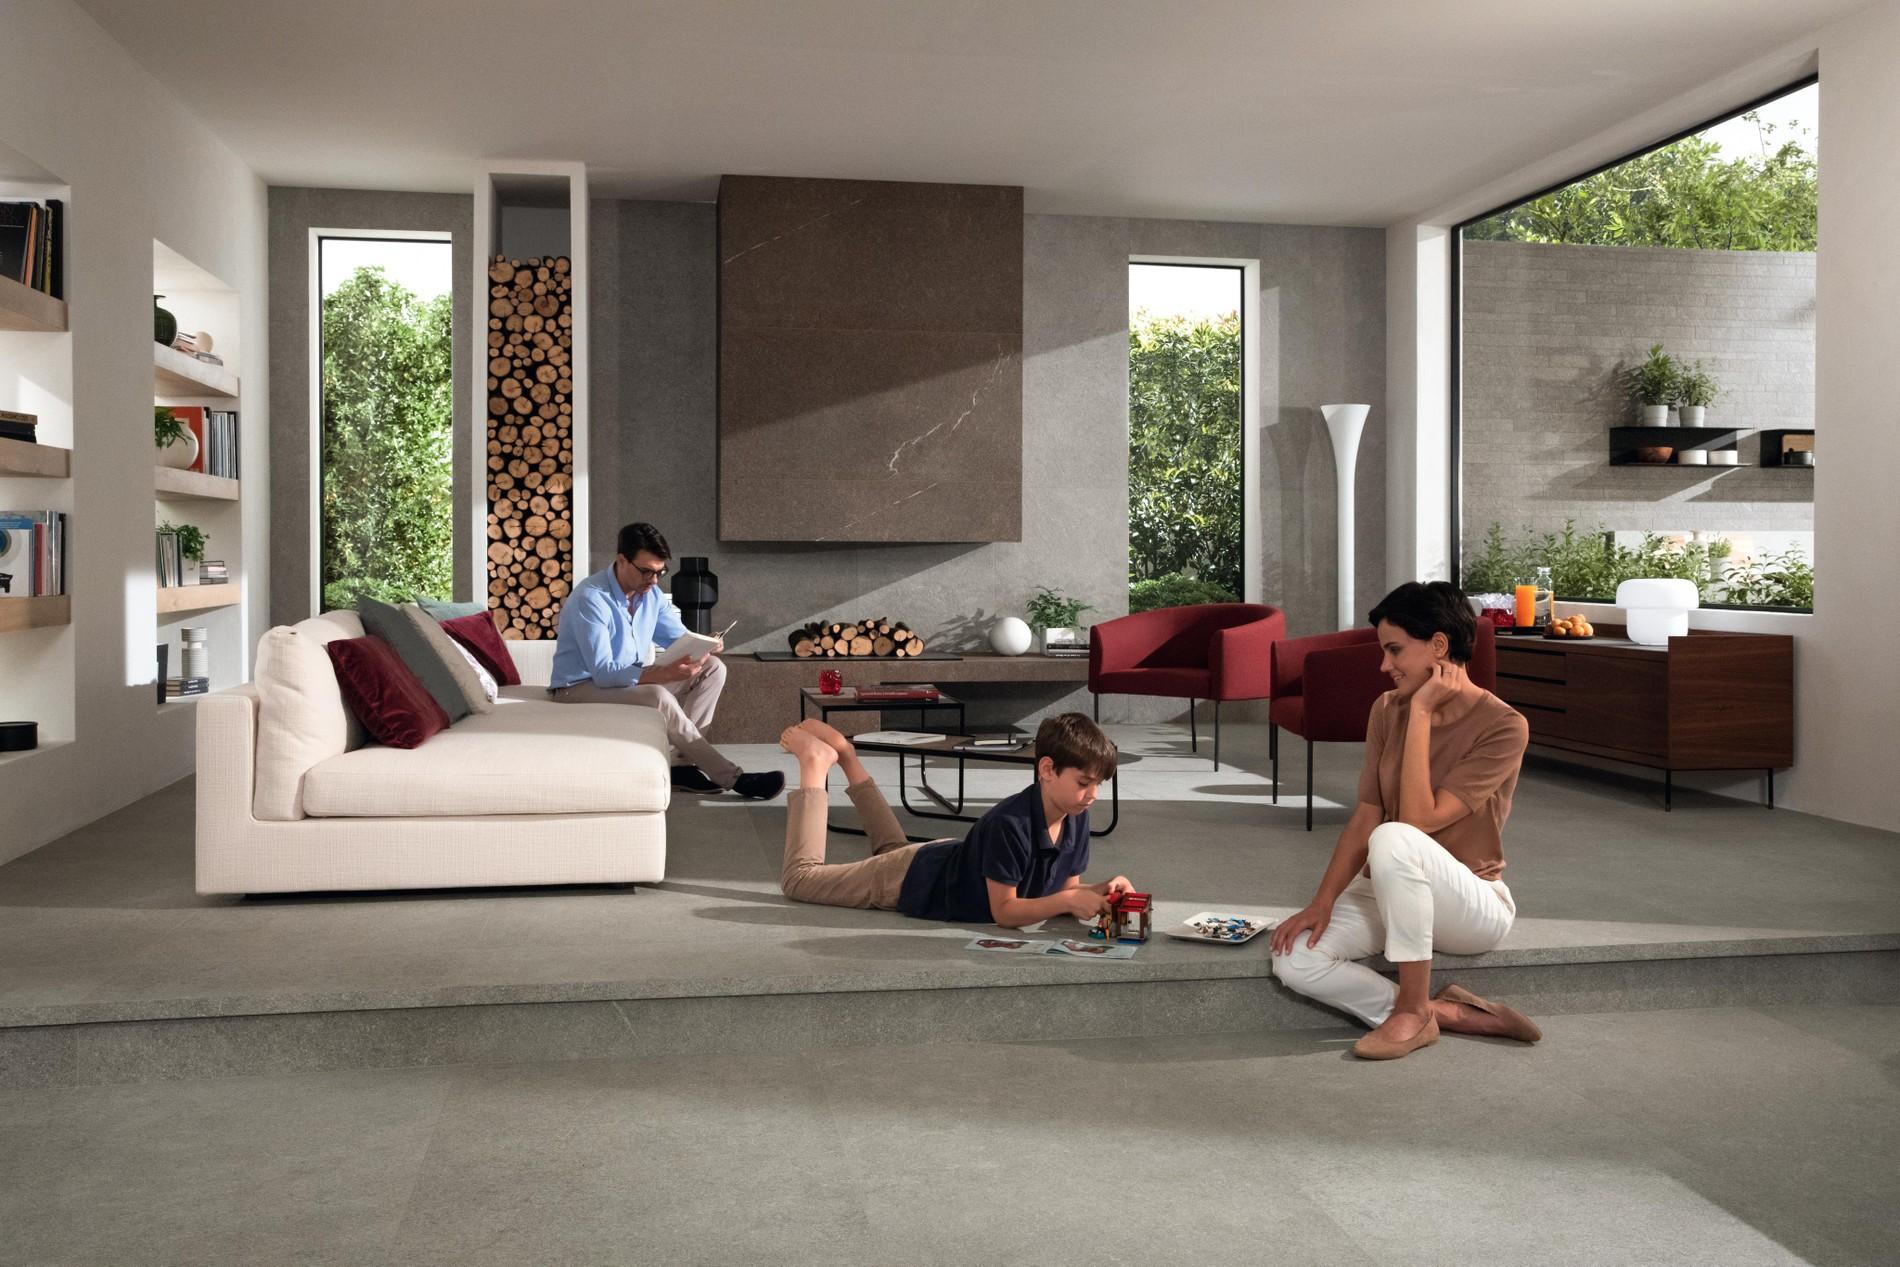 Enjoy your porcelain tiles, enjoy your home